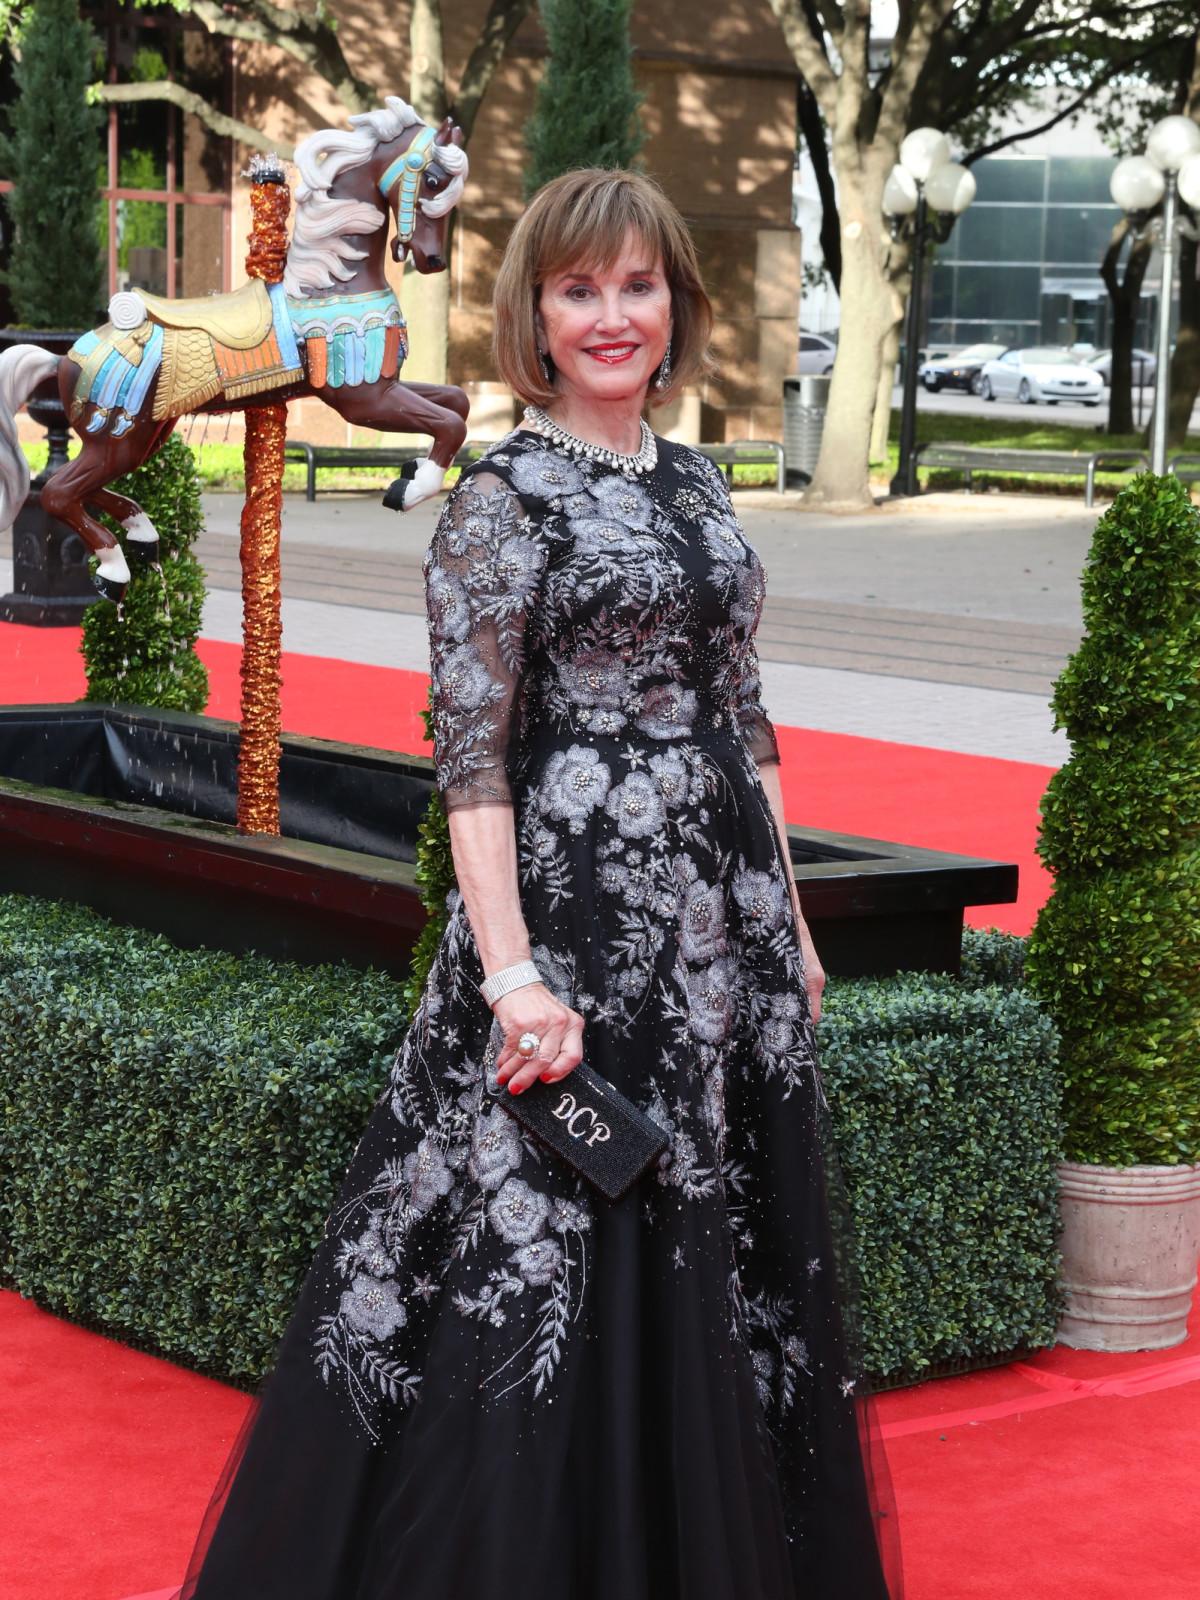 Houston Grand Opera ball gowns, April 2014, Donna Josey Chapman